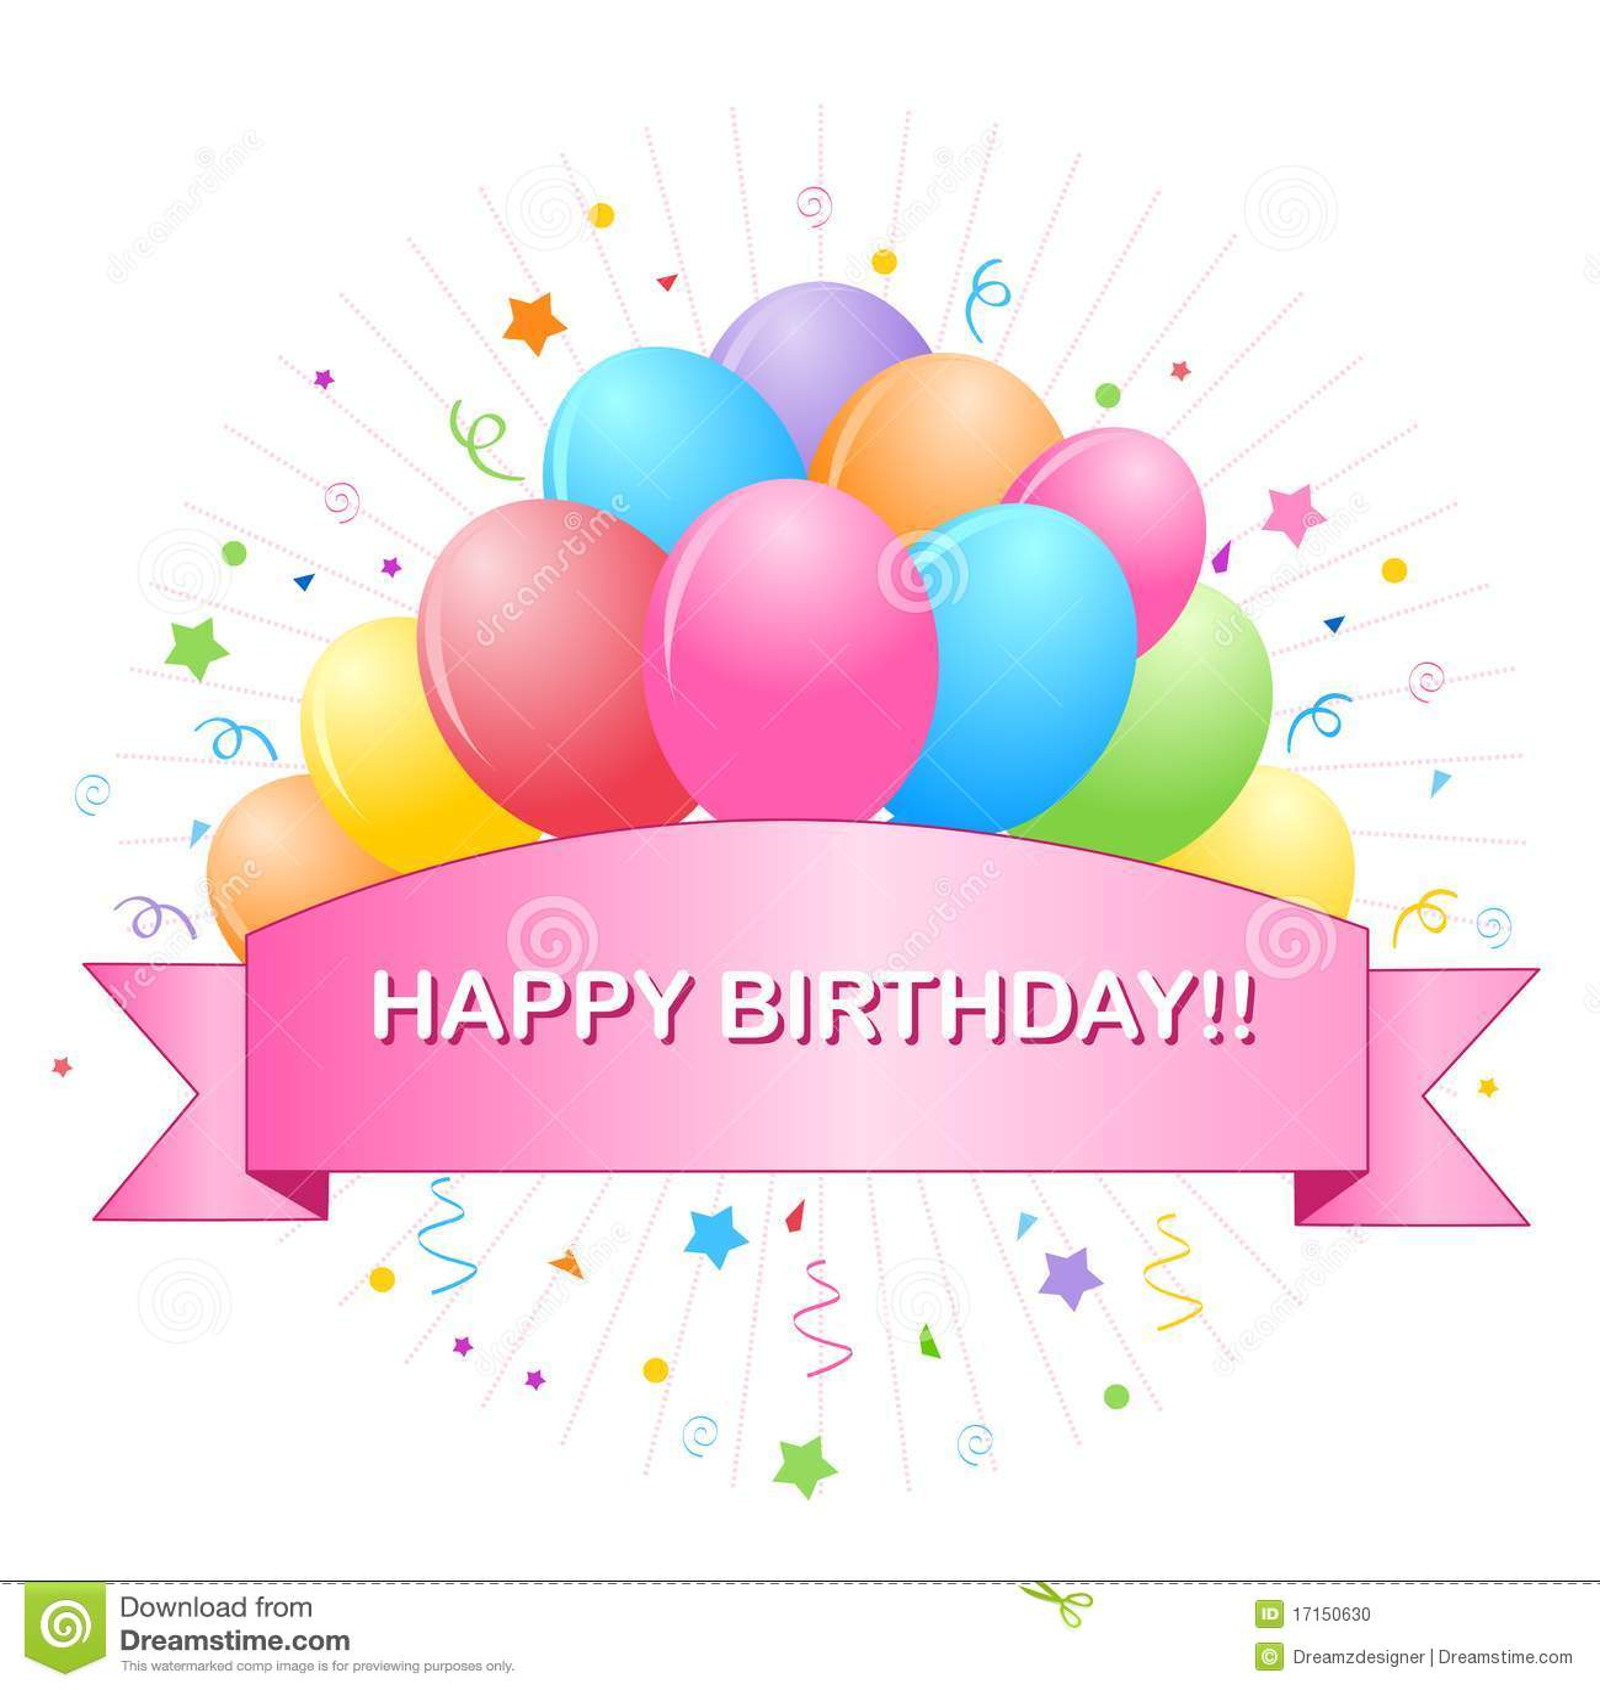 Happy Birthday Balloons Stock Vector Illustration Of Illustrations